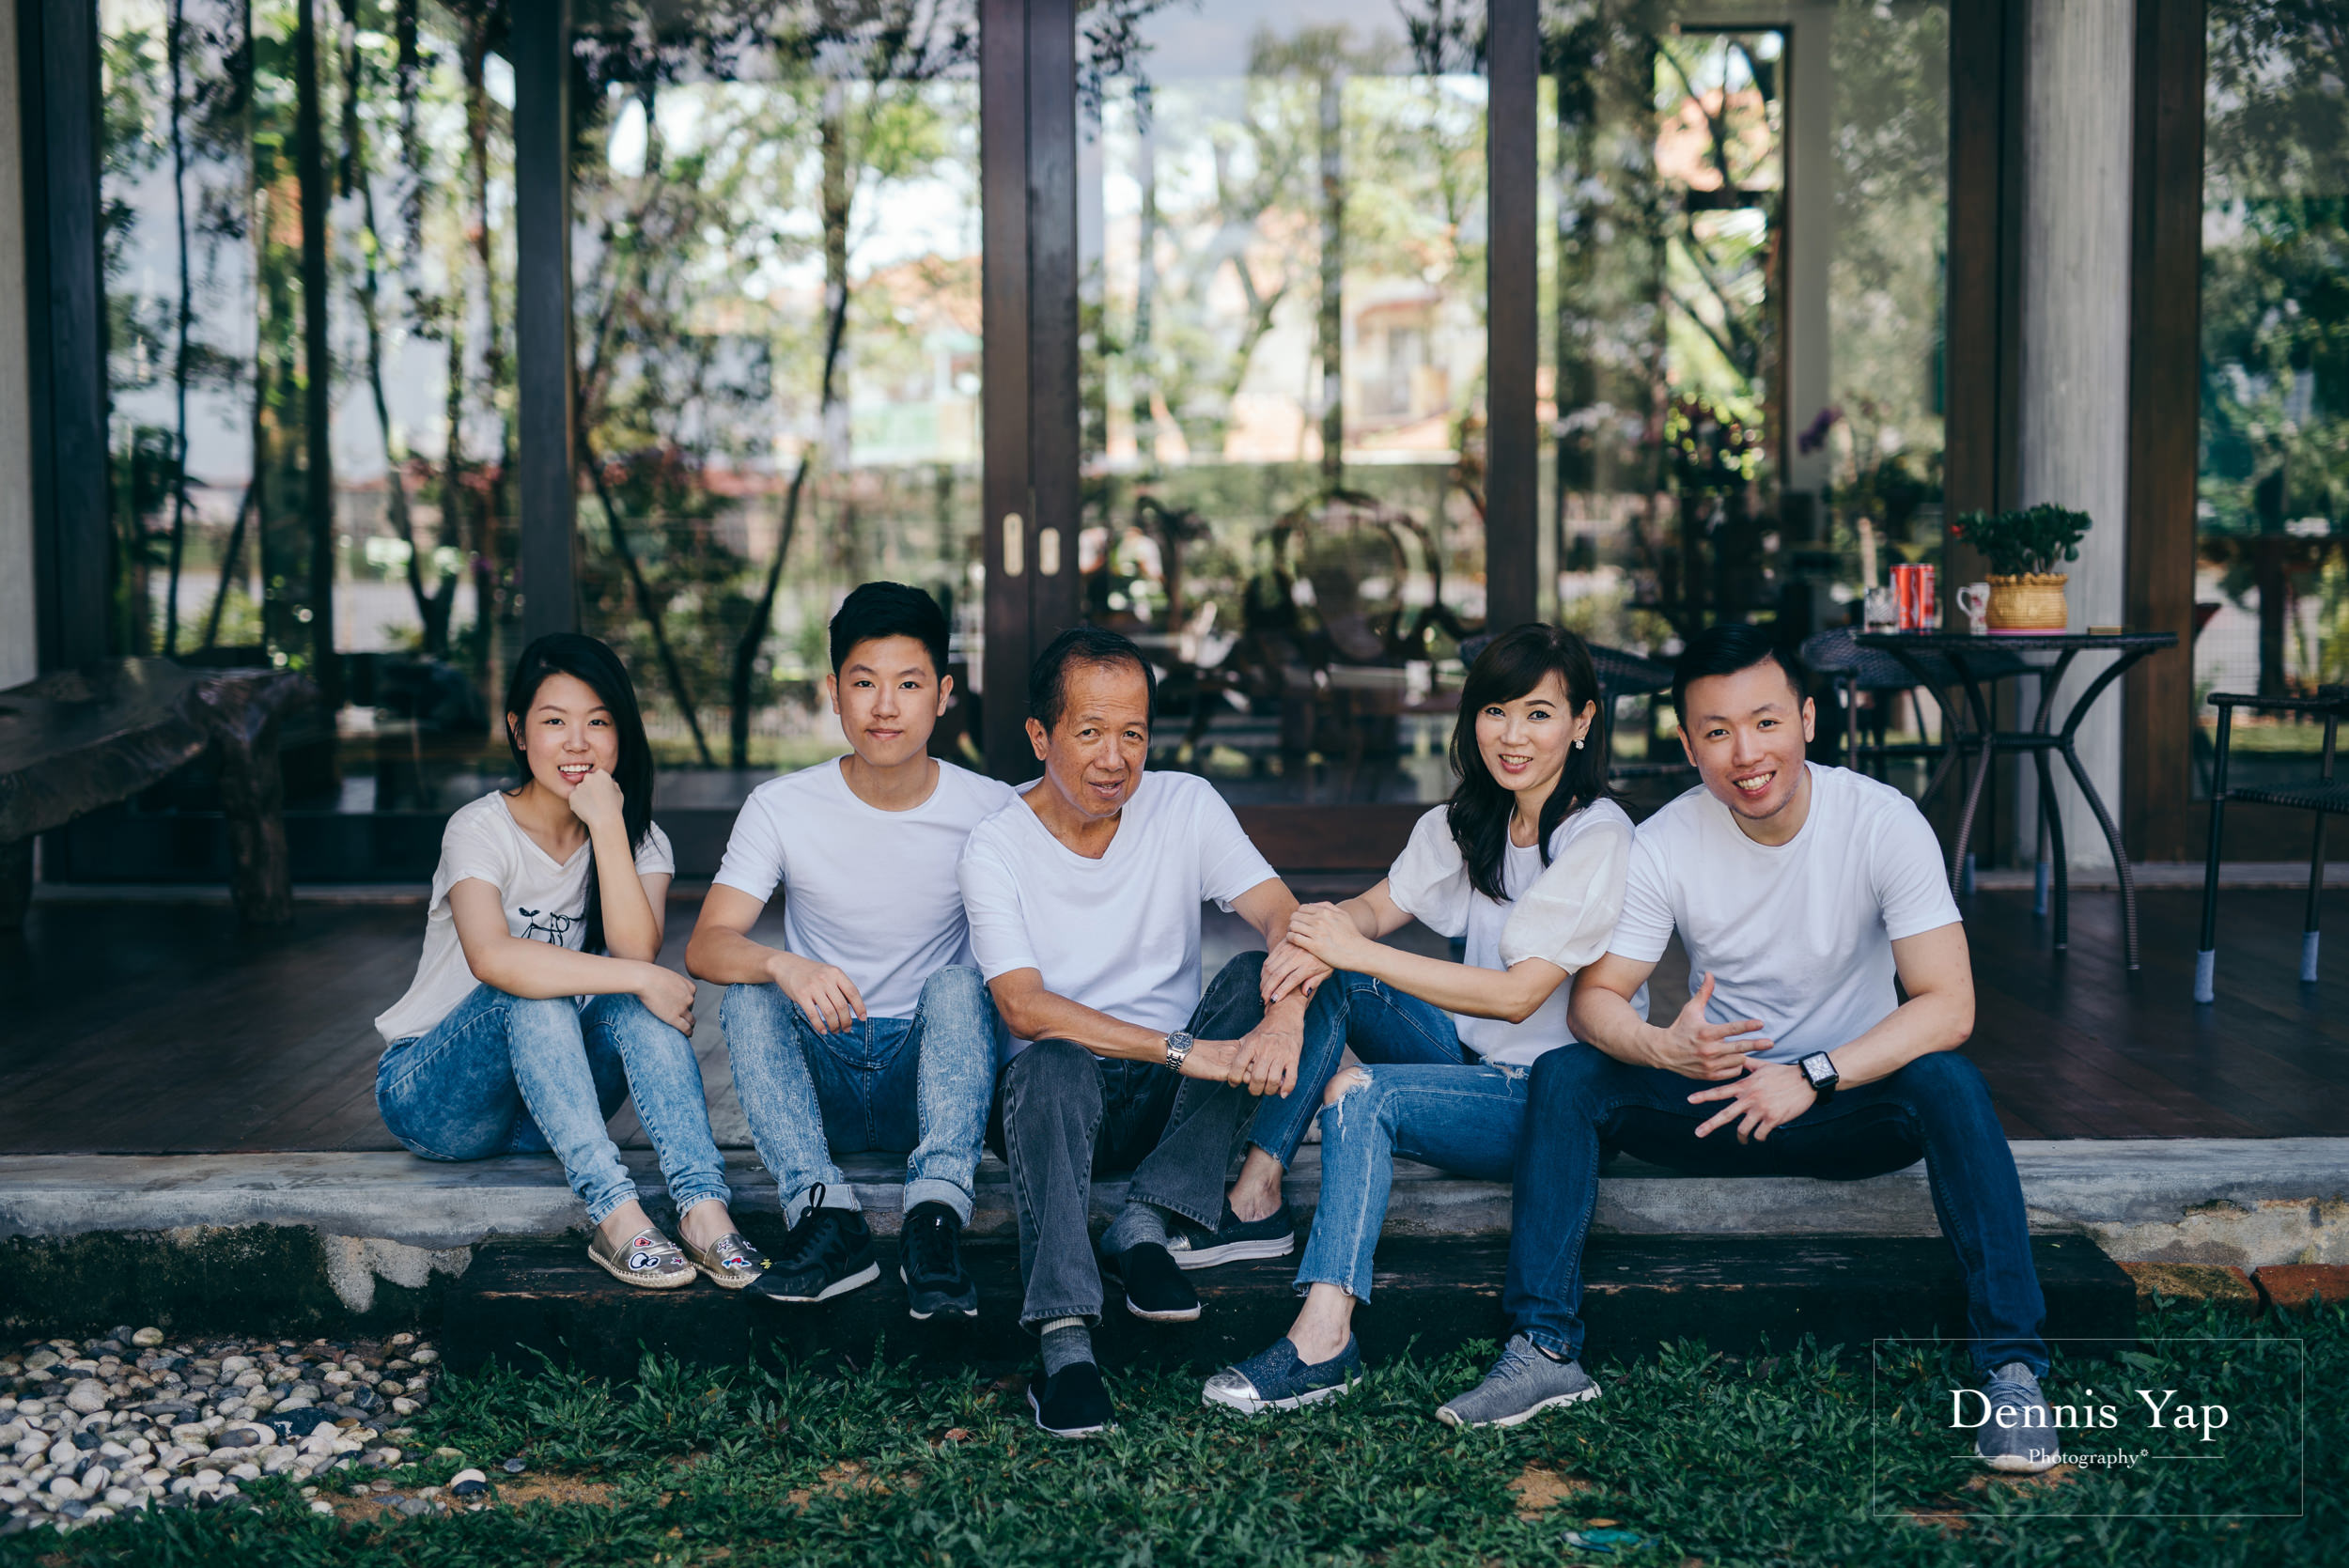 joanna family portrait luxury casual candid family portrait dennis yap photography-9.jpg